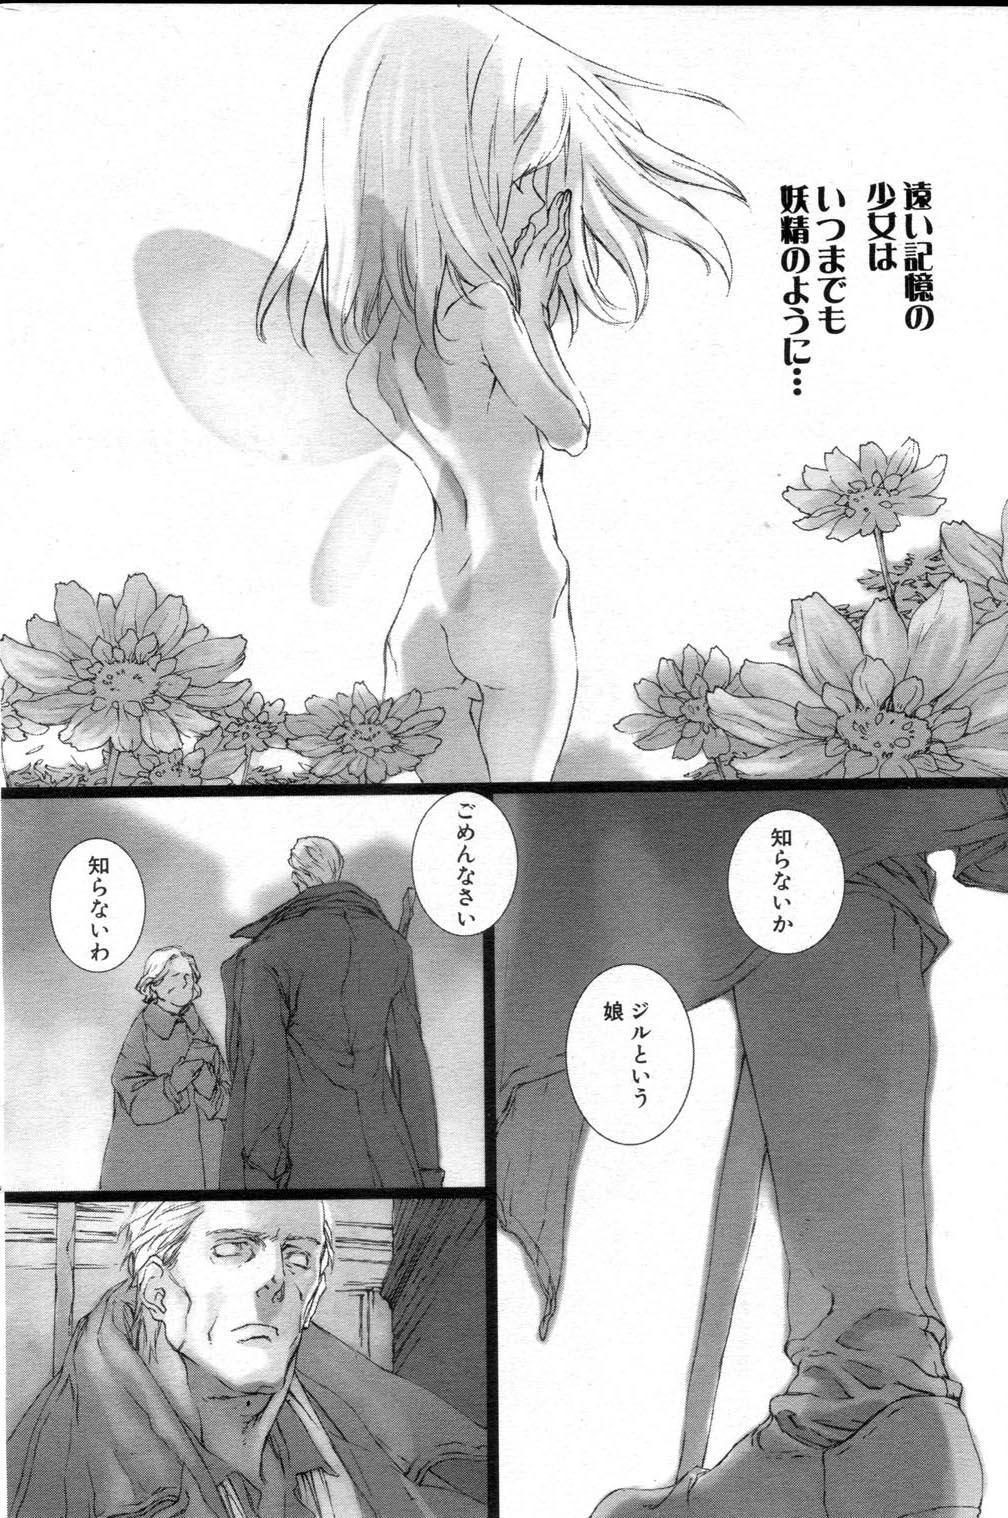 [Saiki Keita] FAIRY GONE GARDEN (Part Two) Kouhen 1